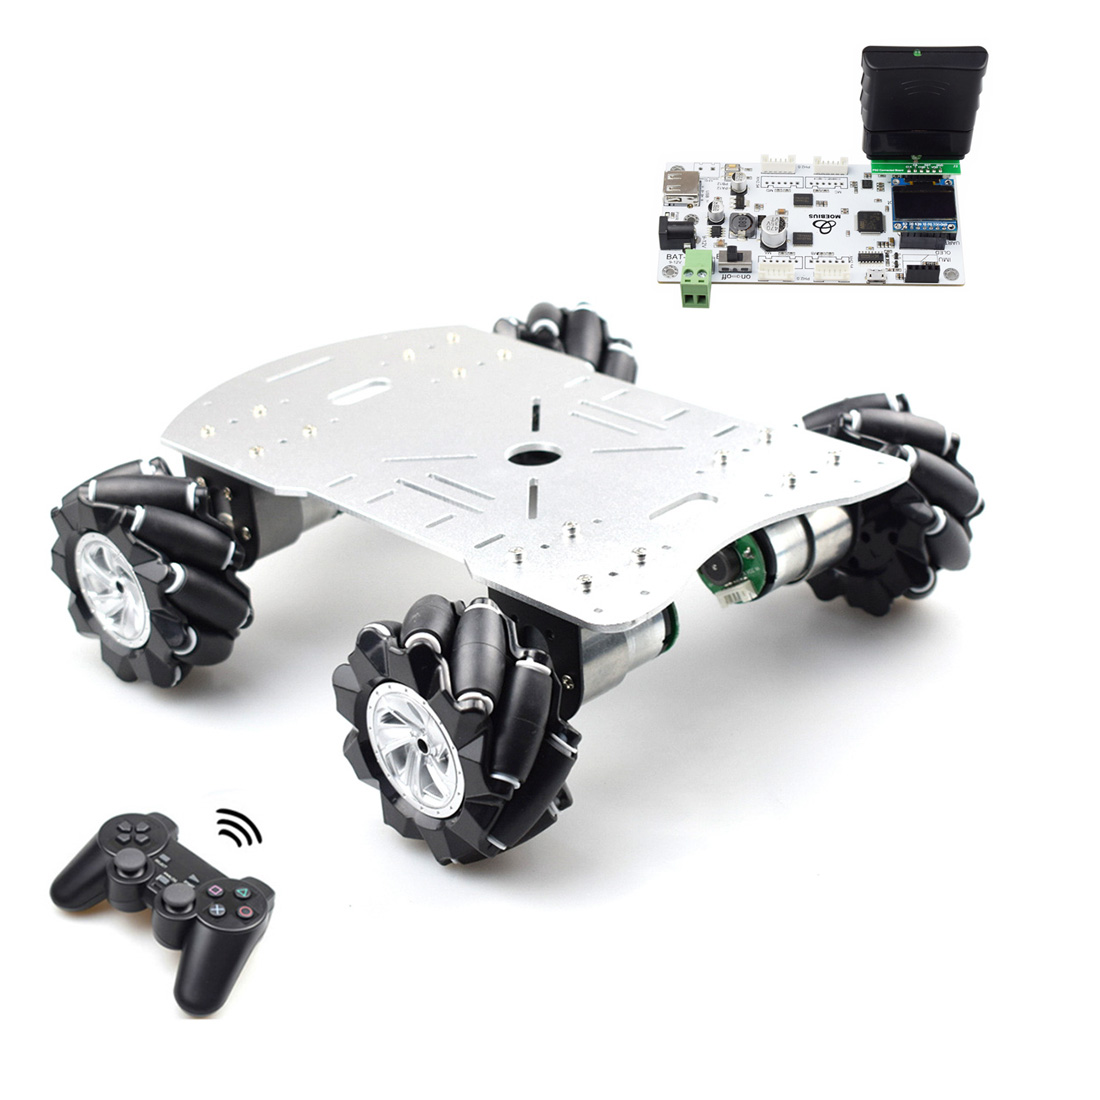 80mm Mecanum Metal Platform DIY Omni-Directional Mecanum Wheel Robot Car With STM32 Electronic Control (Without Power Supply)